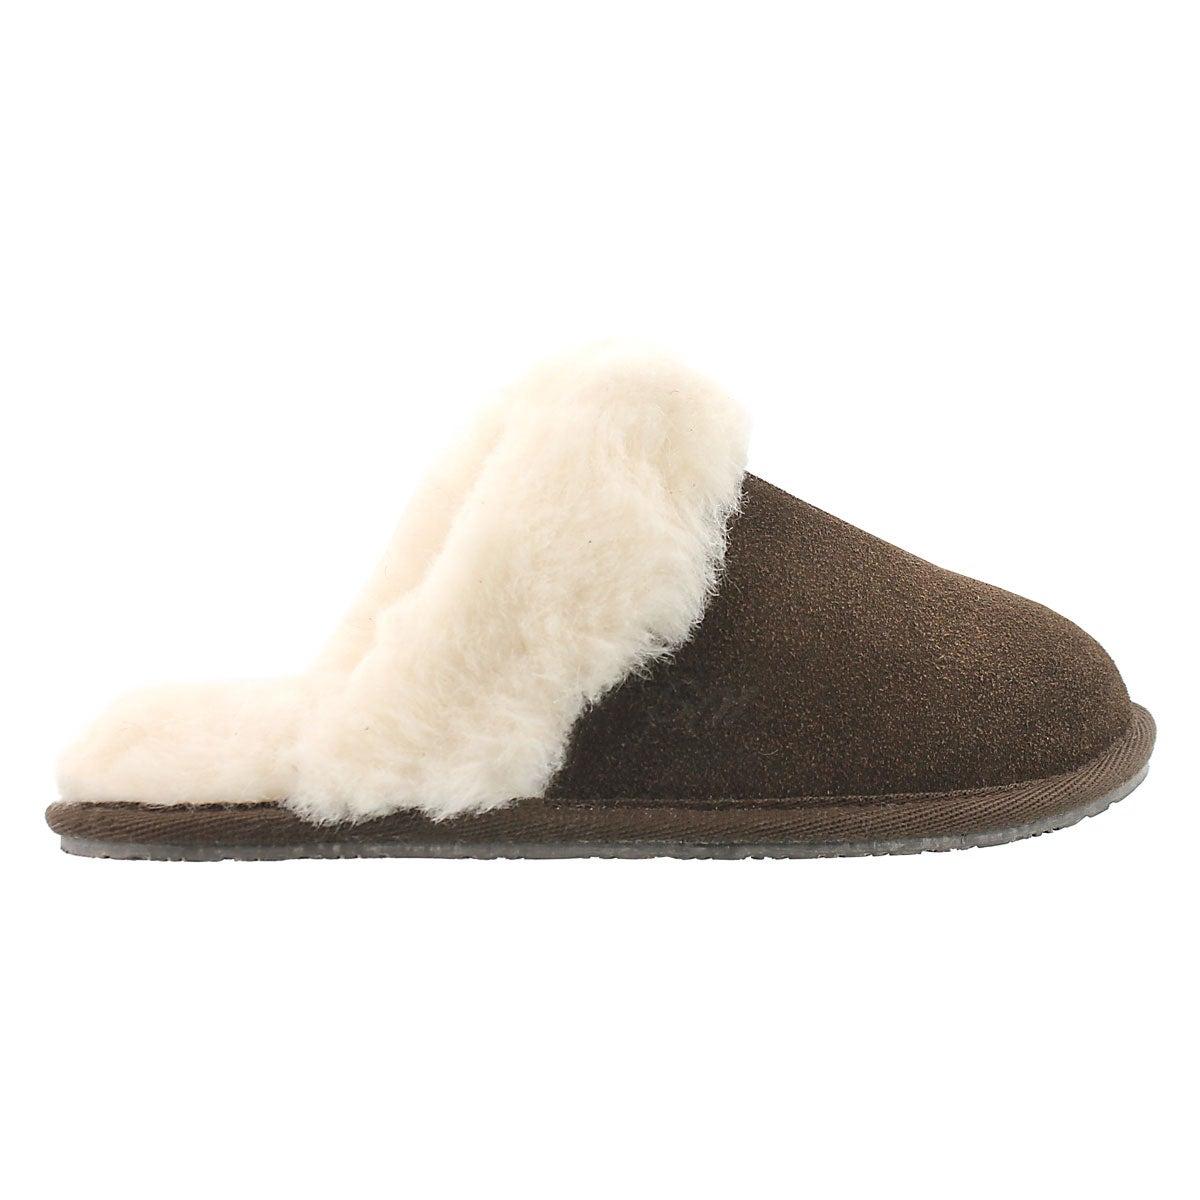 Lds Sassy chocolate mem. foam slipper